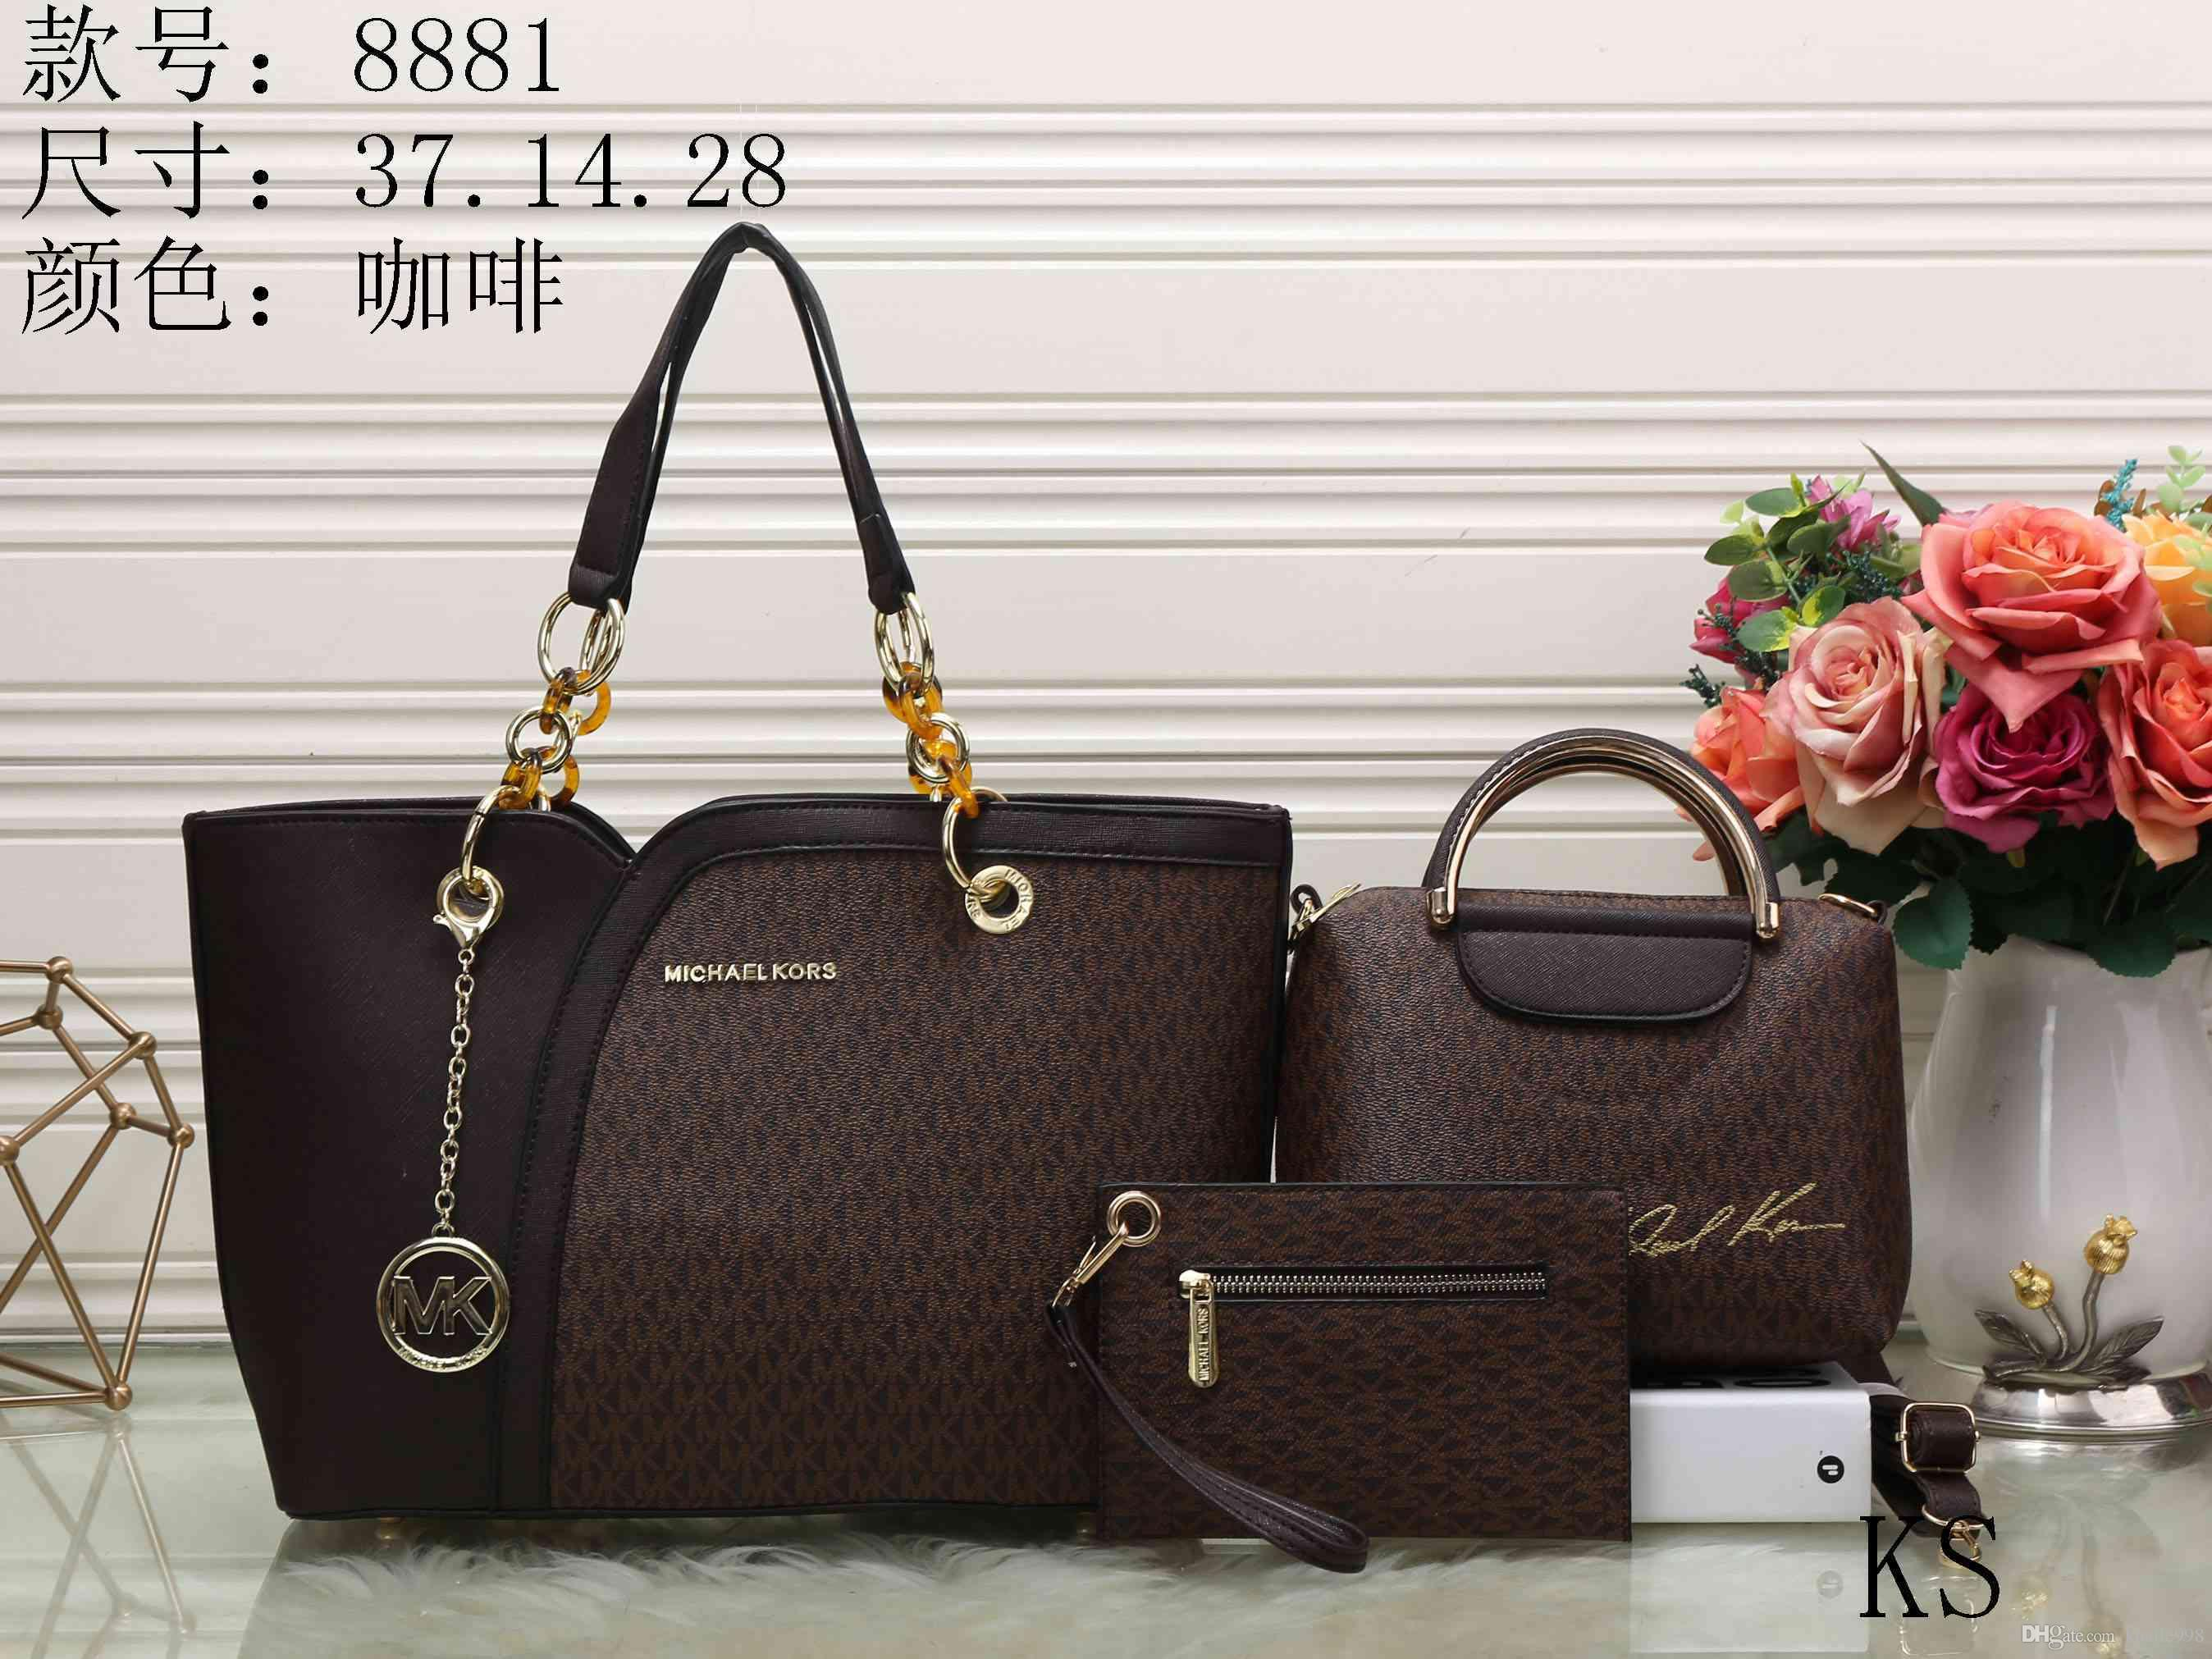 6fb1406cddc The Most Popular Women'S Bags Ladies Handbags Designer Bags Women Tote Bag  Luxury Brands Bags Single Shoulder Bag Backpack Wallet Tags E068 Leather ...